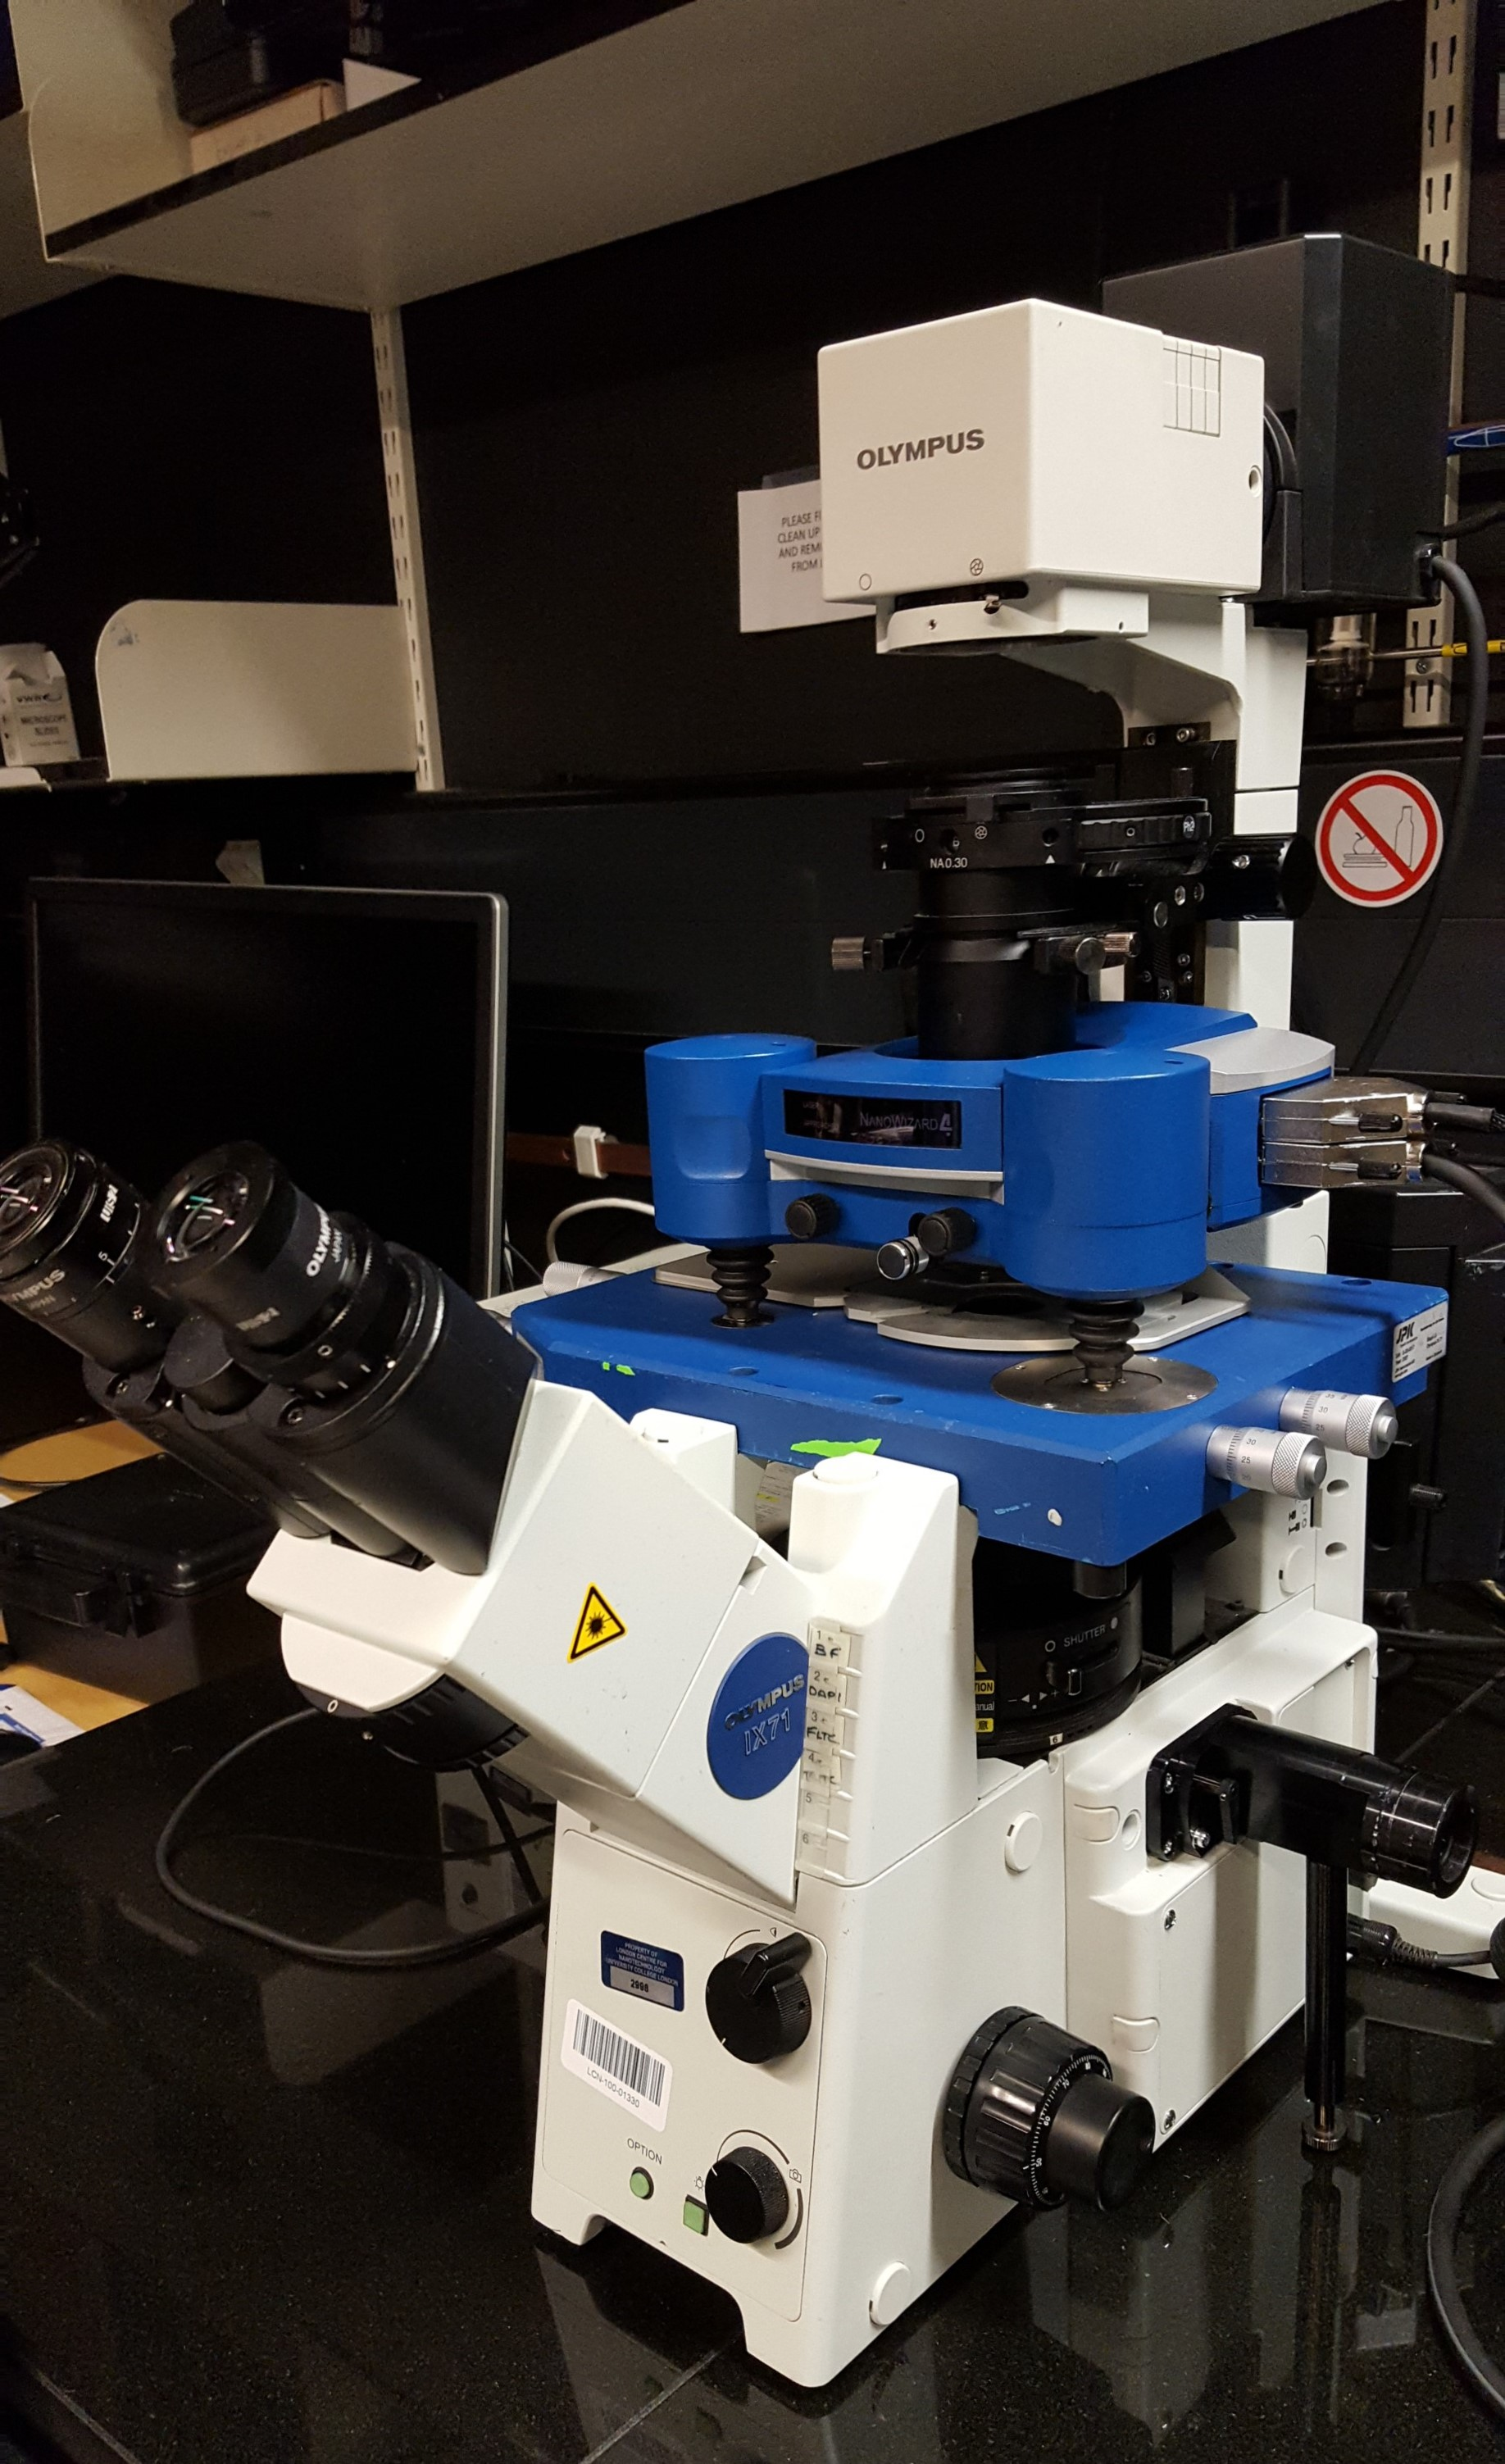 JPK Nanowizard 4 BioScience AFM